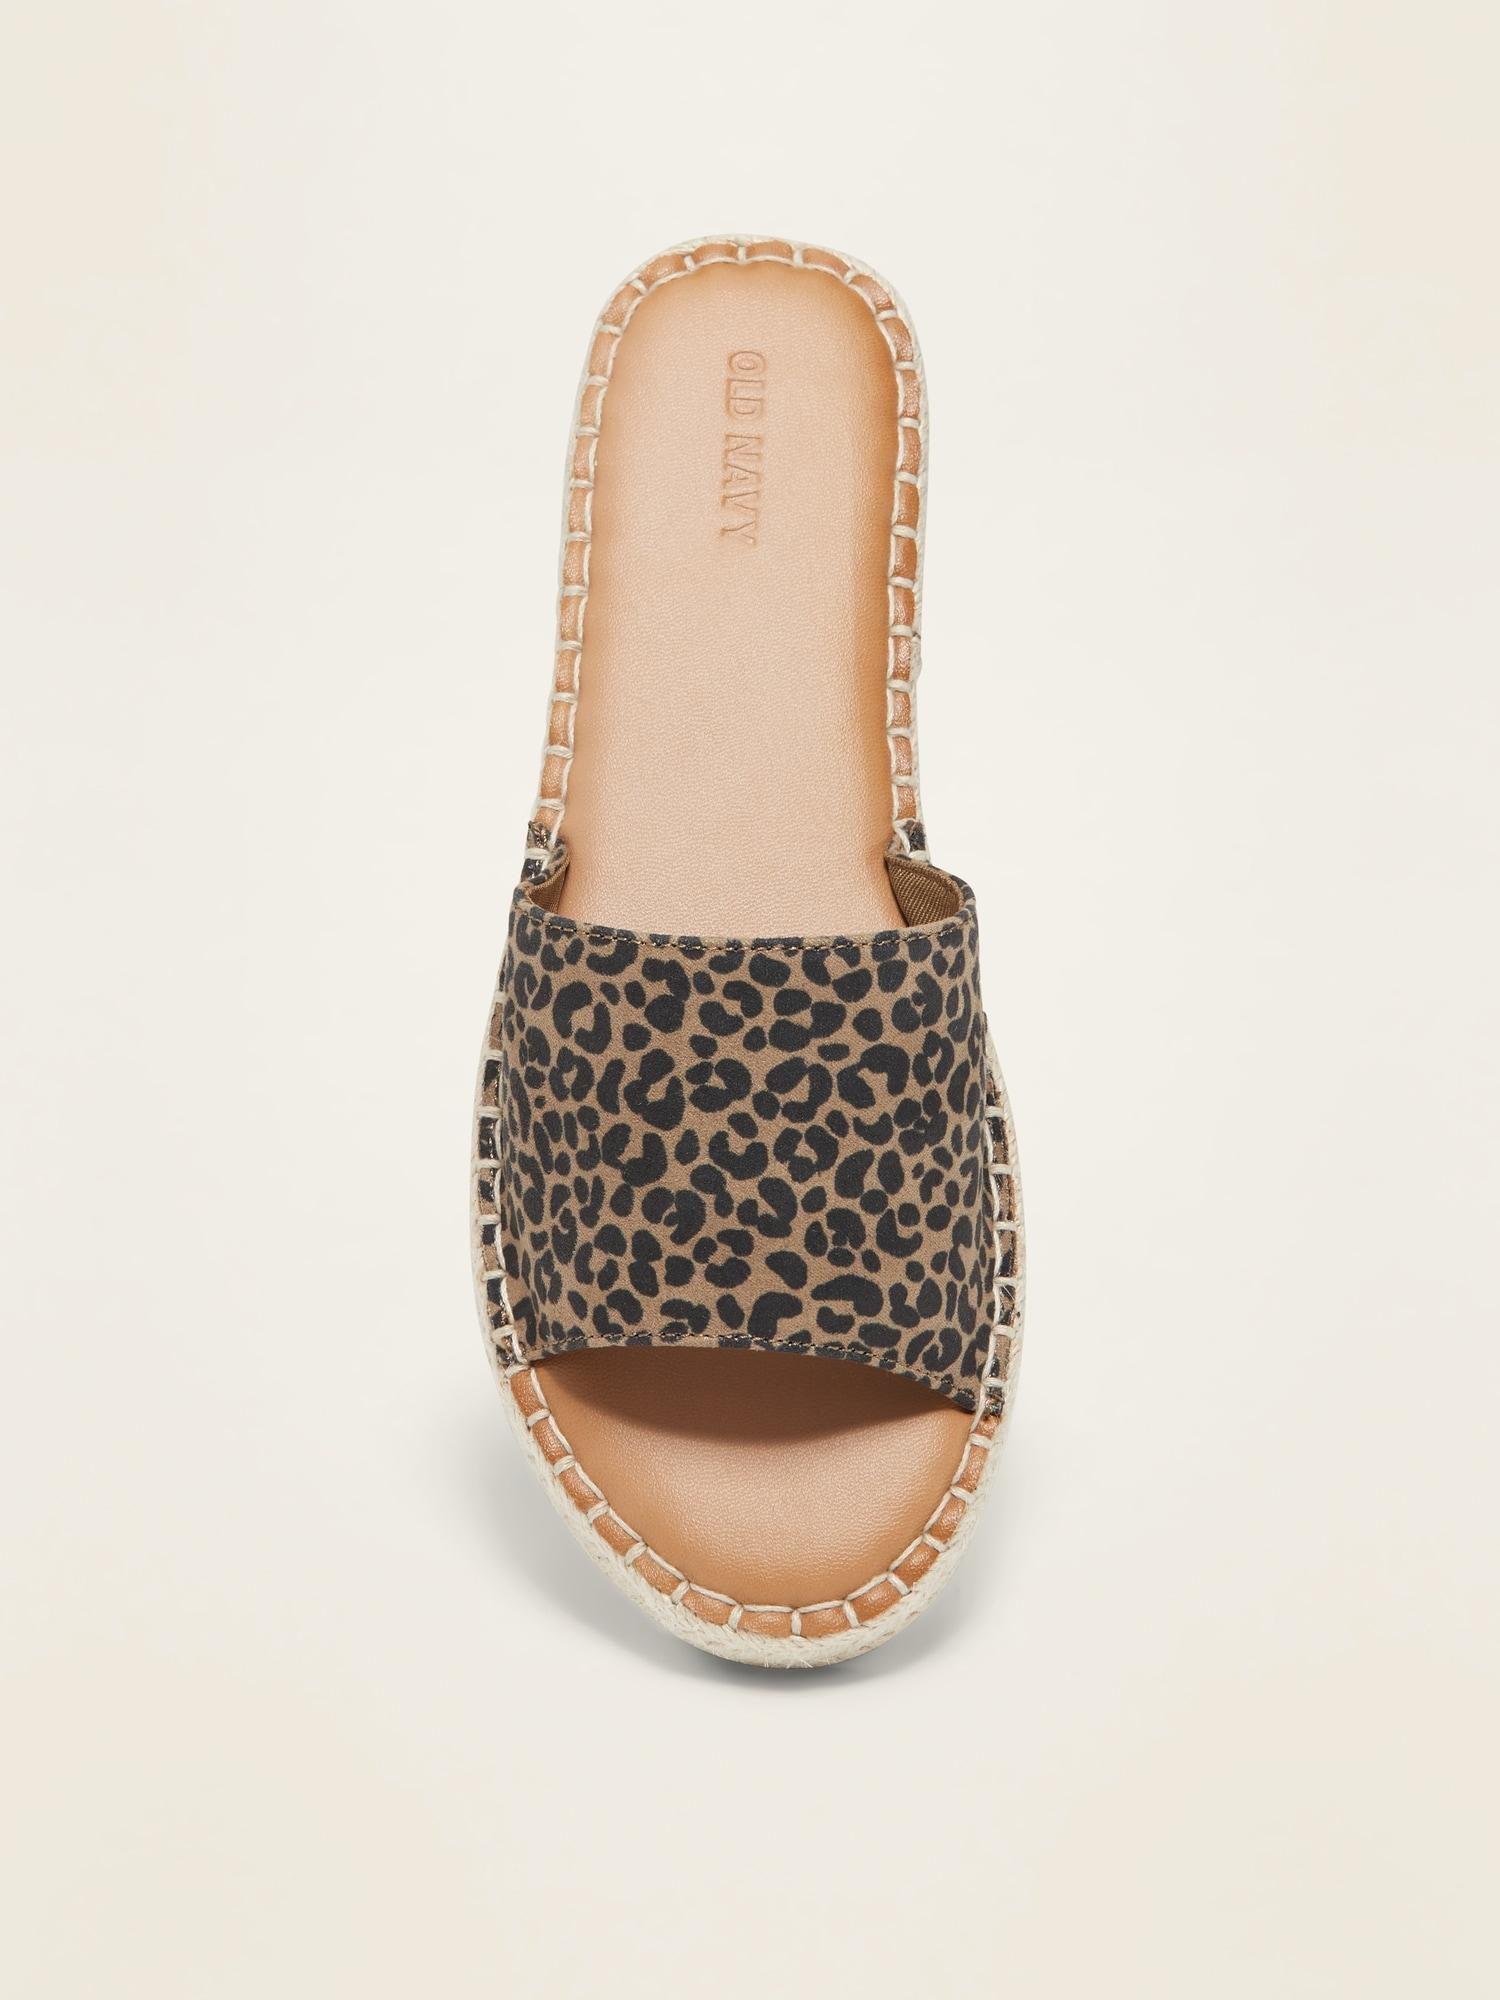 Faux-Suede Espadrille Slide Sandals for